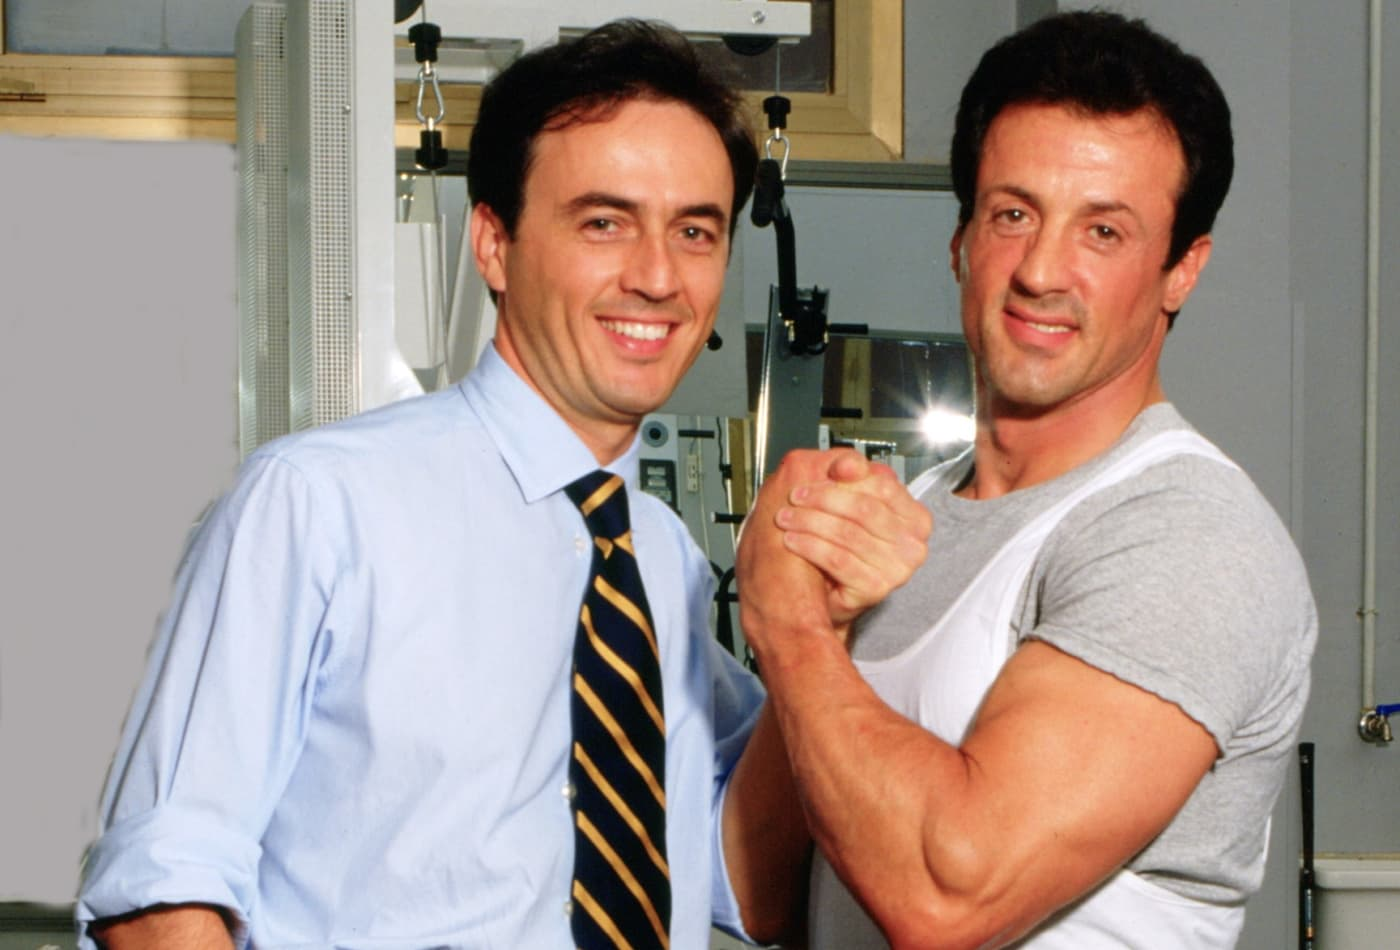 How Nerio Alessandri started Technogym, worth $2.4 billion, in his garage in Italy